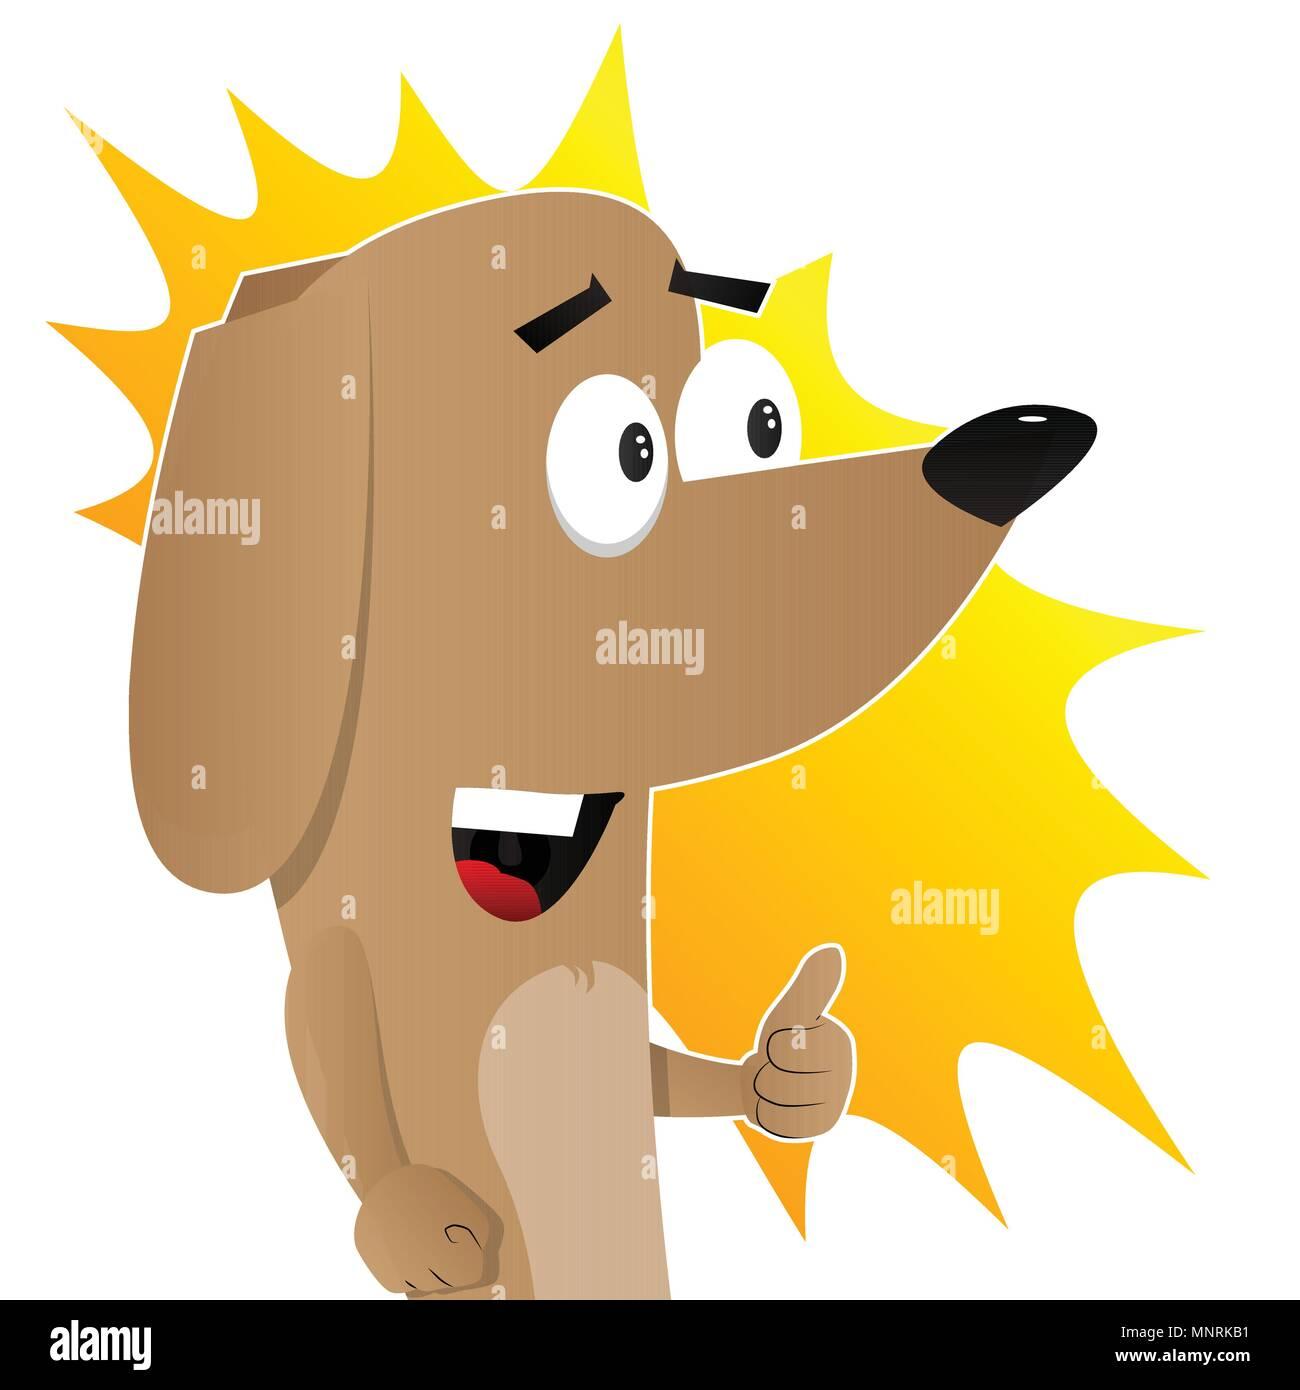 Cartoon illustrated I like dog showing thumb up sign. - Stock Vector